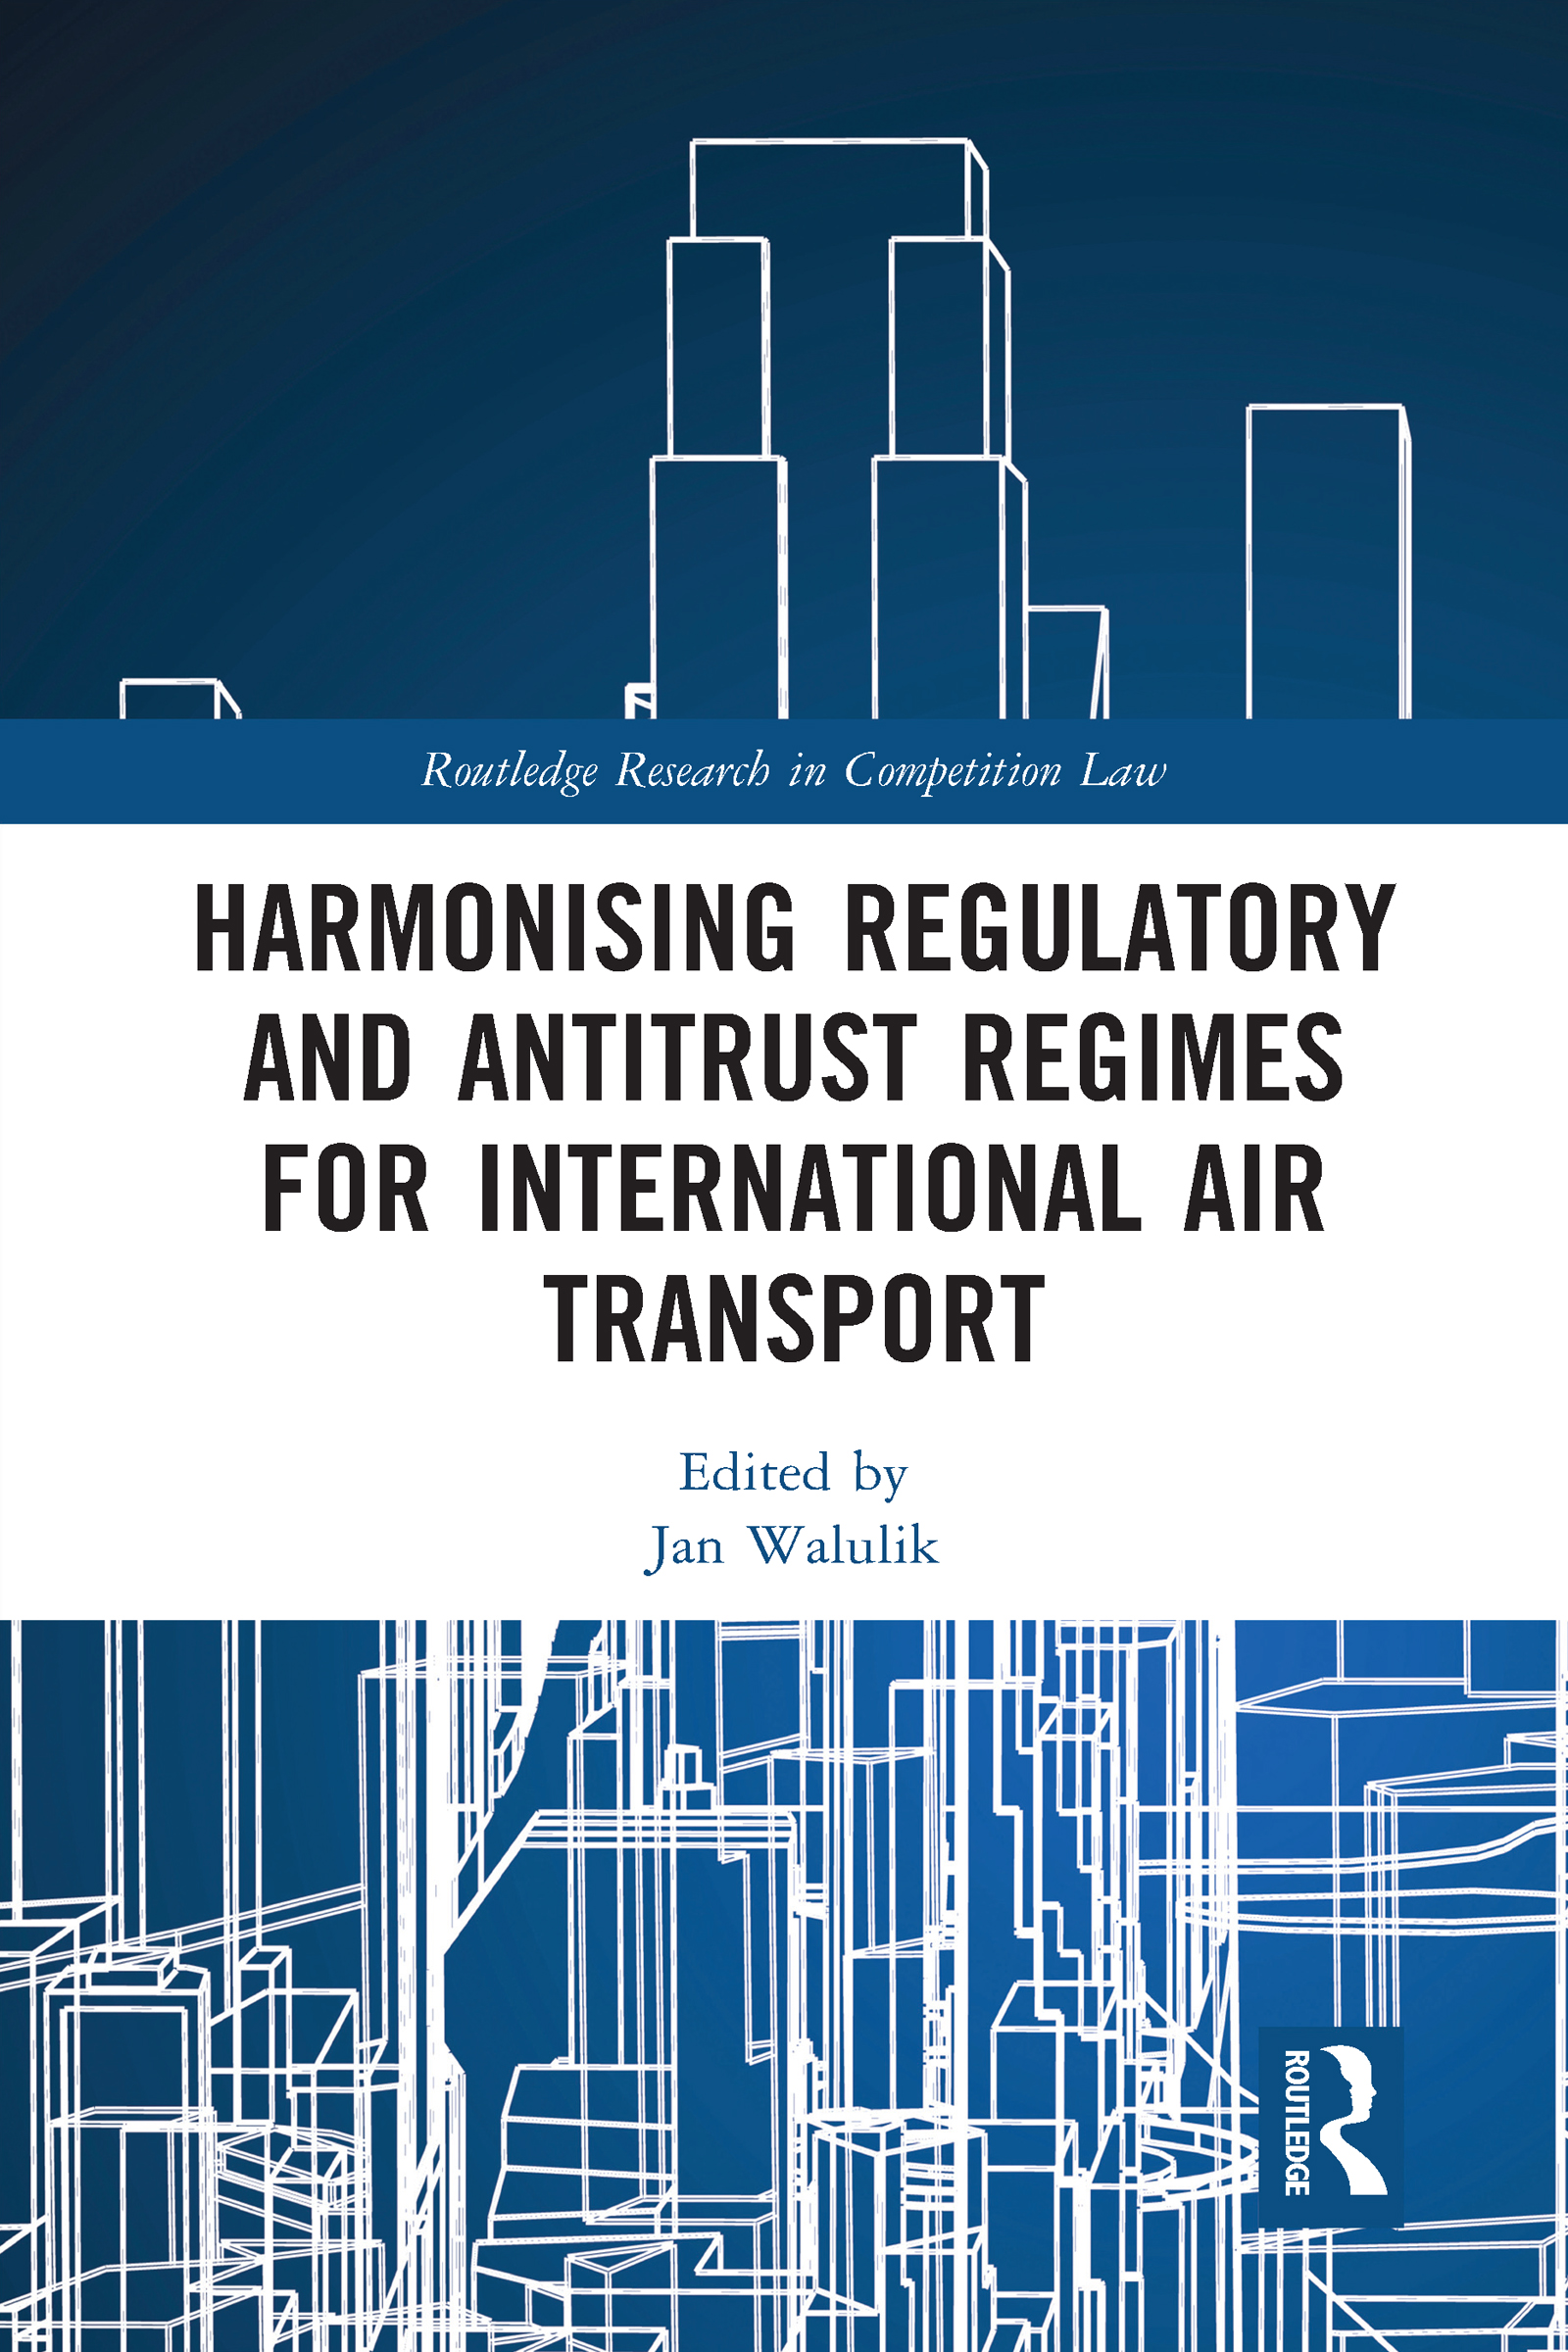 Harmonising Regulatory and Antitrust Regimes for International Air Transport